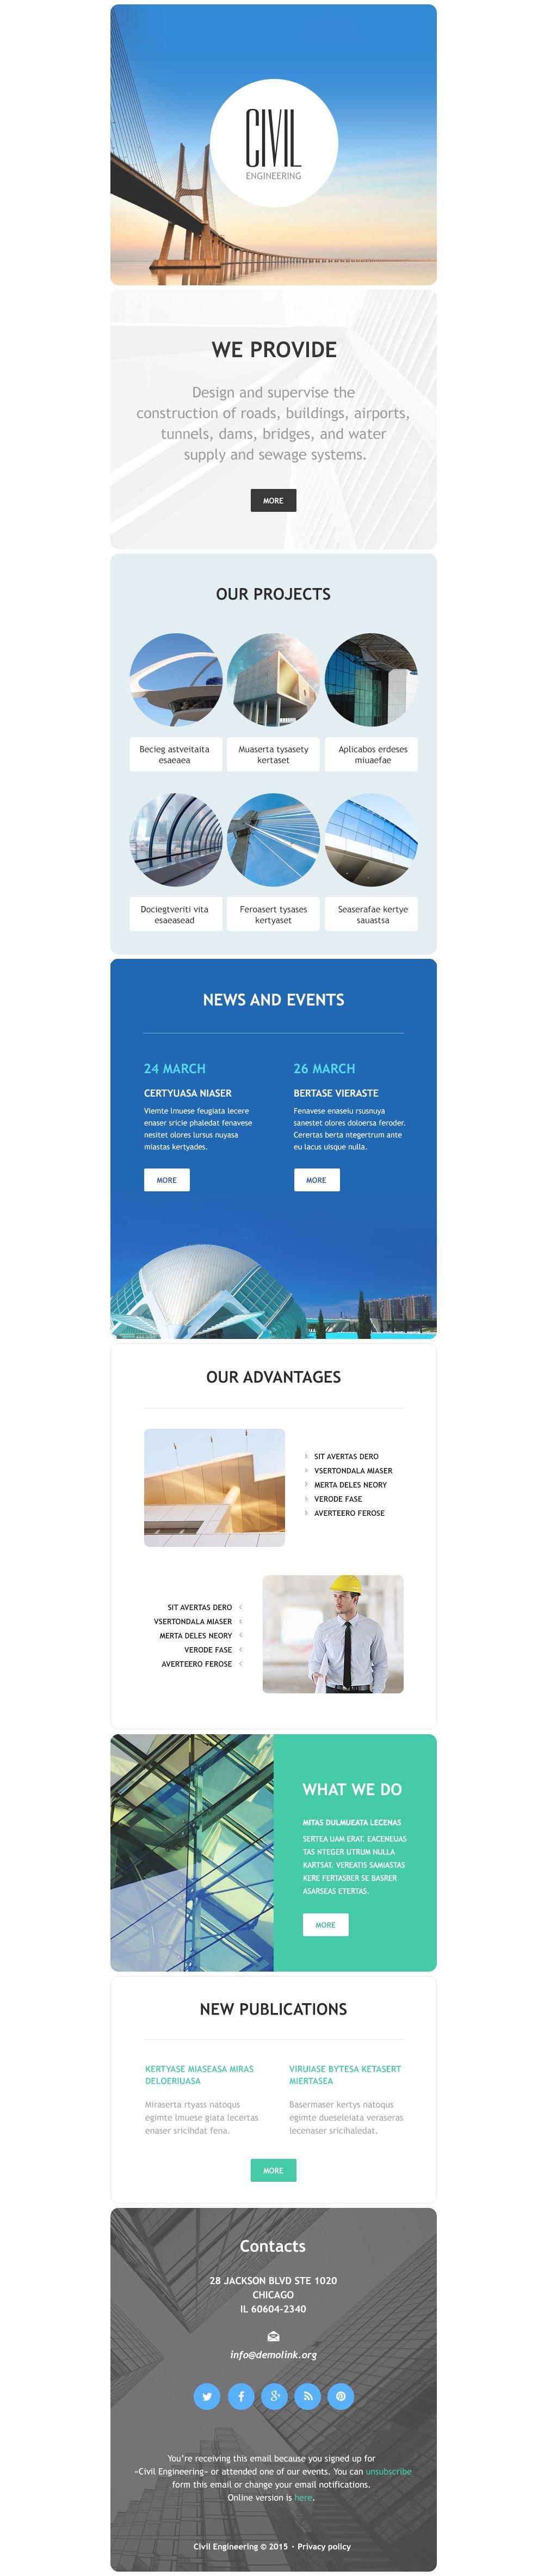 Civil Engineering Responsive Newsletter Template - screenshot